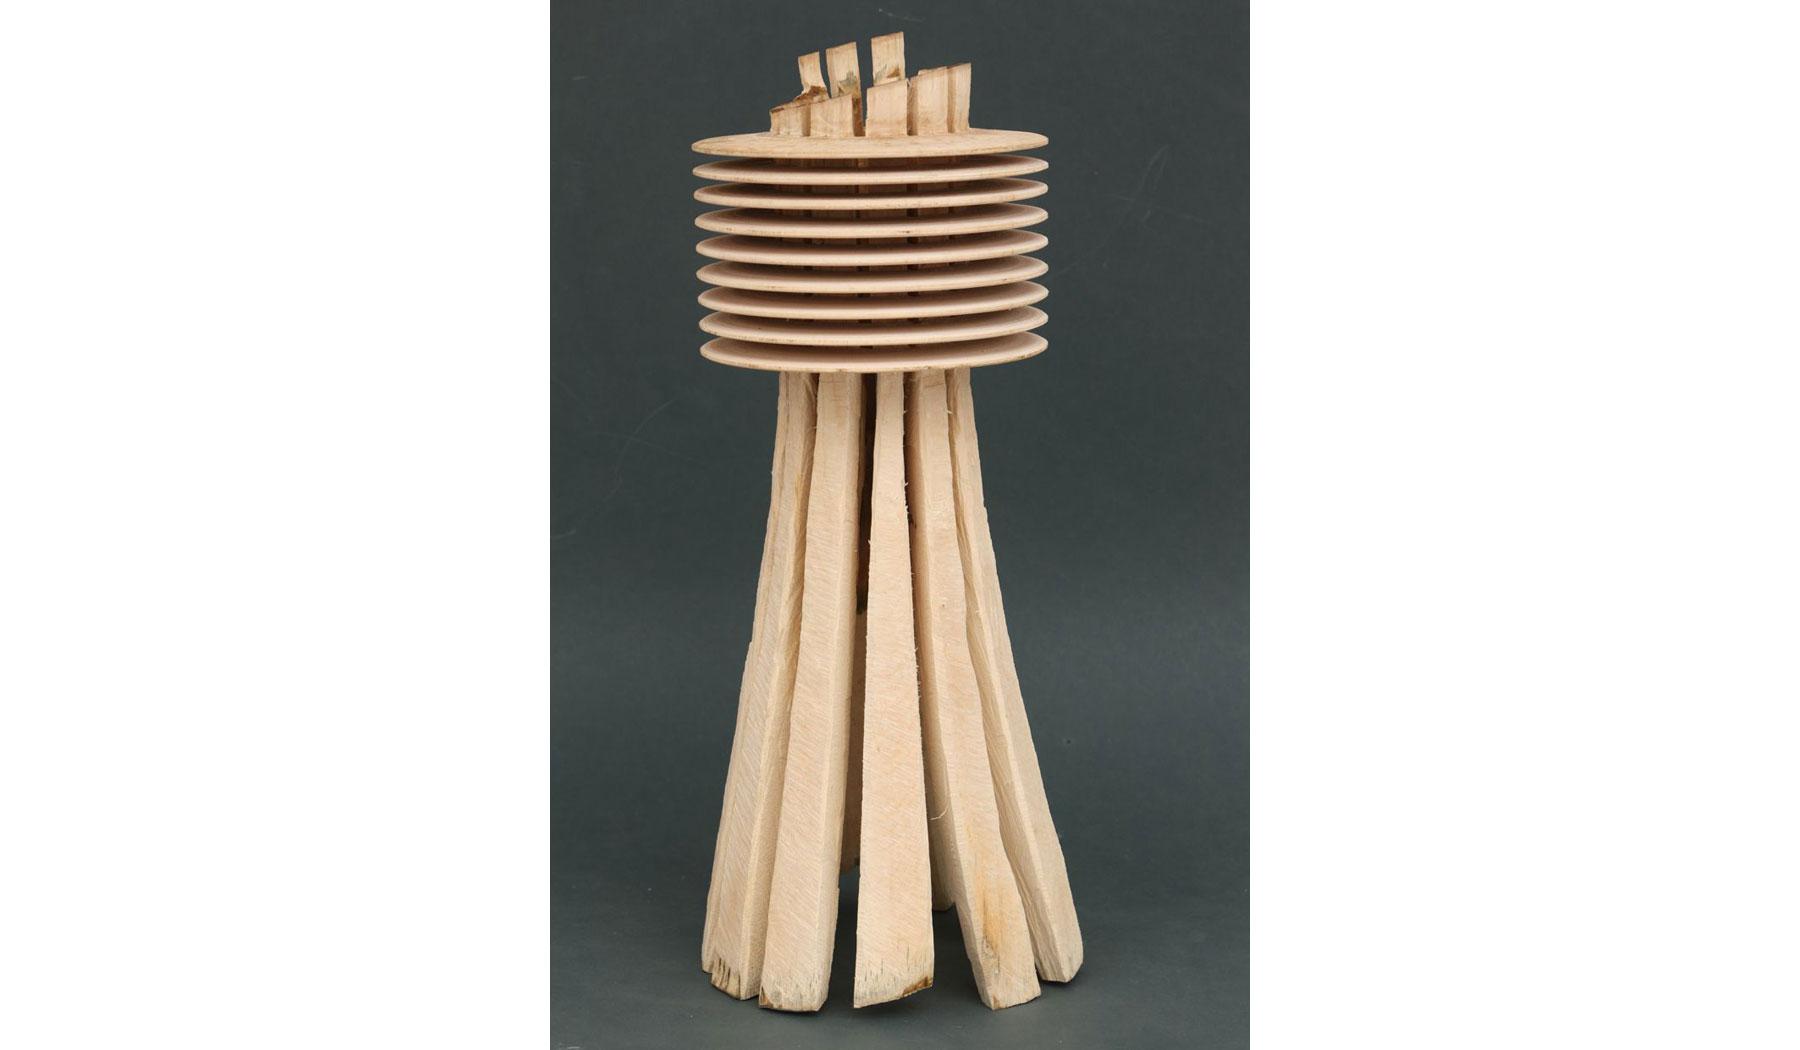 Objekte-aus-Holz-Hoerst-Du-mich-Johannes-Hofbauer